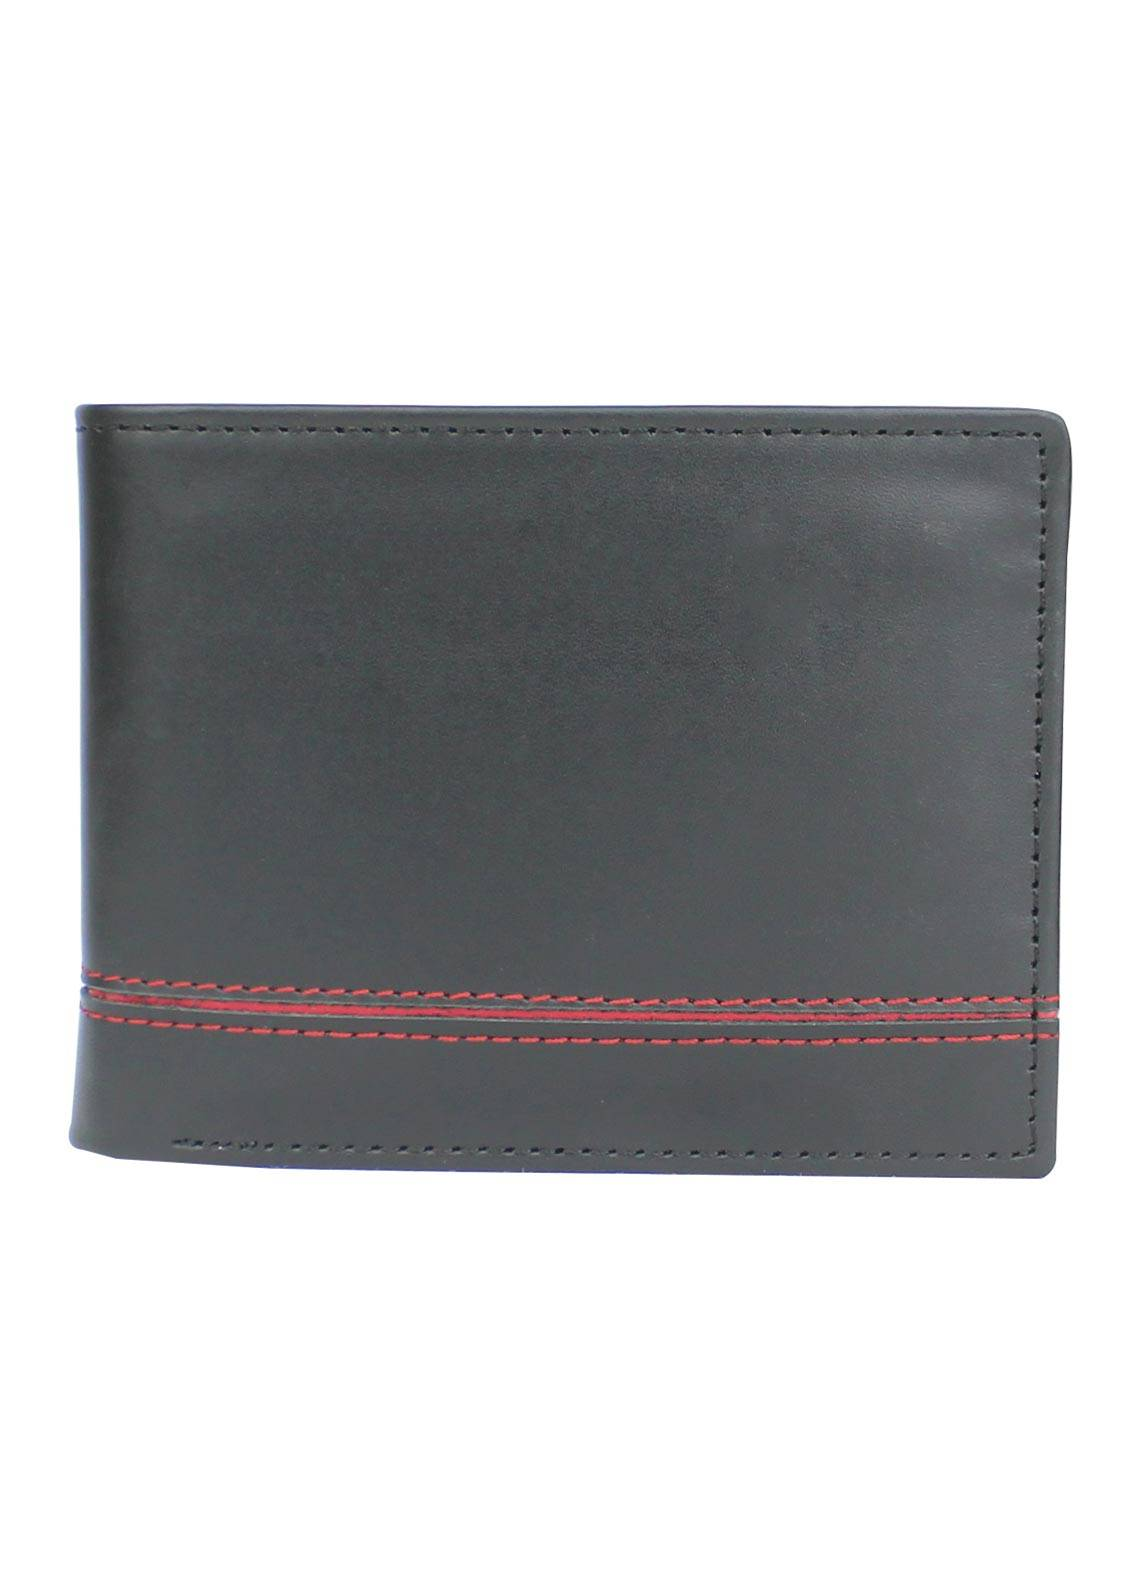 Shahzeb Saeed Plain Texture Leather Wallet W-064 - Men's Accessories